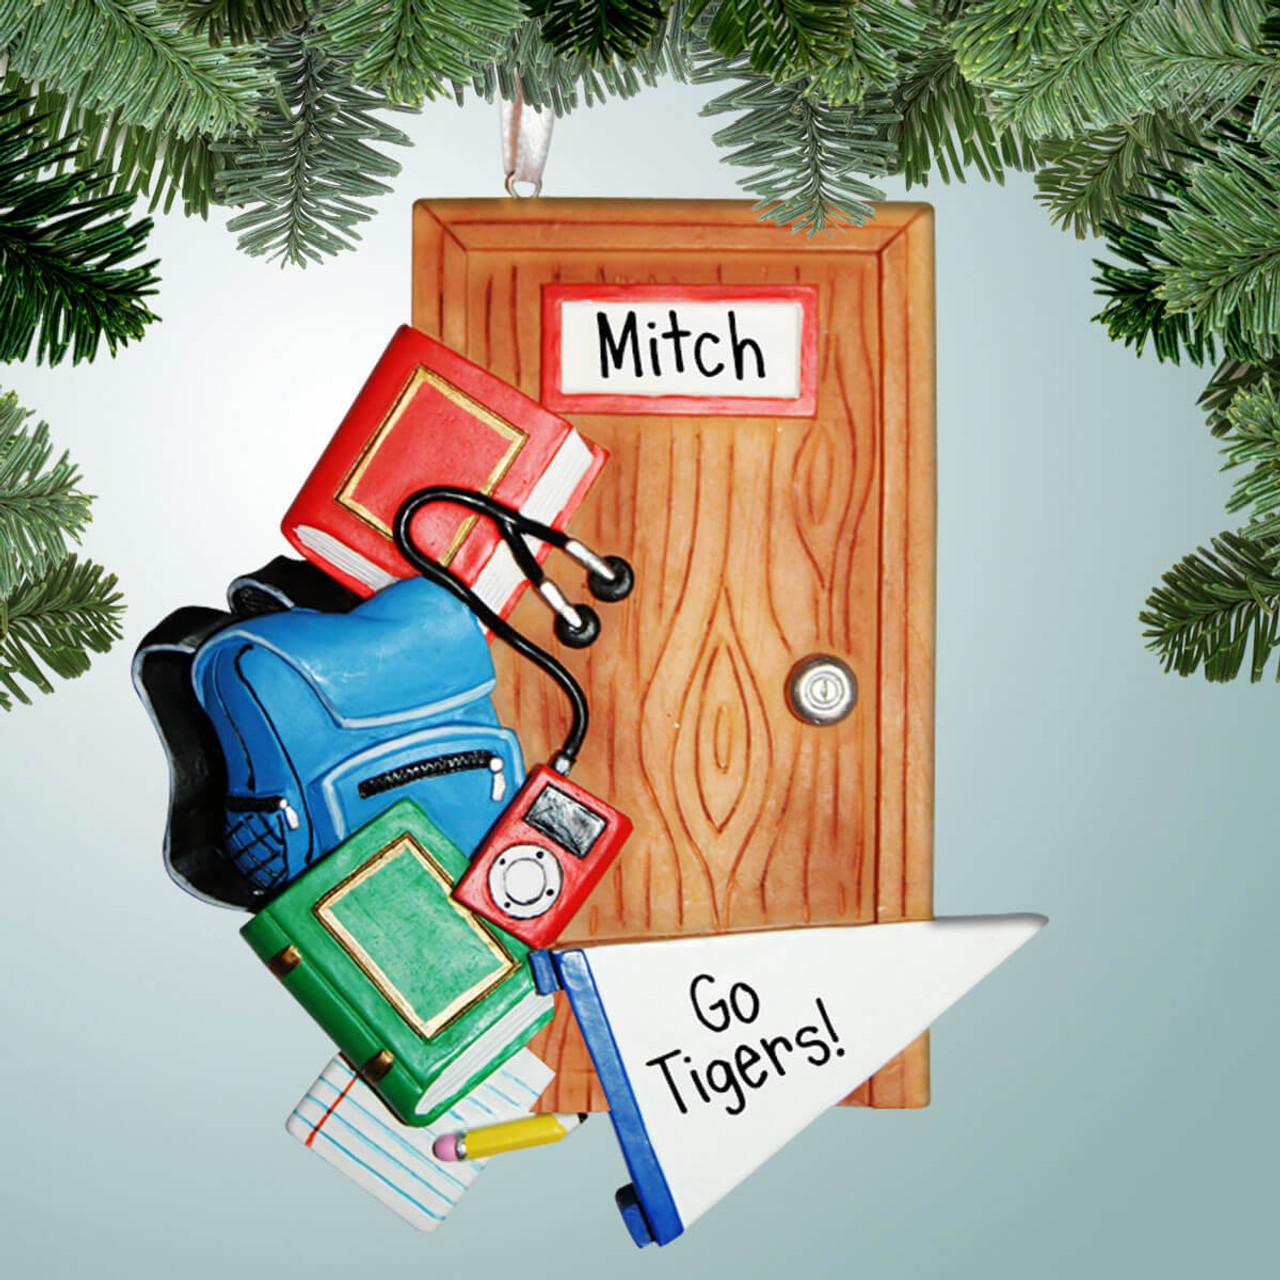 New Dorm Door Personalized Christmas Tree Ornament